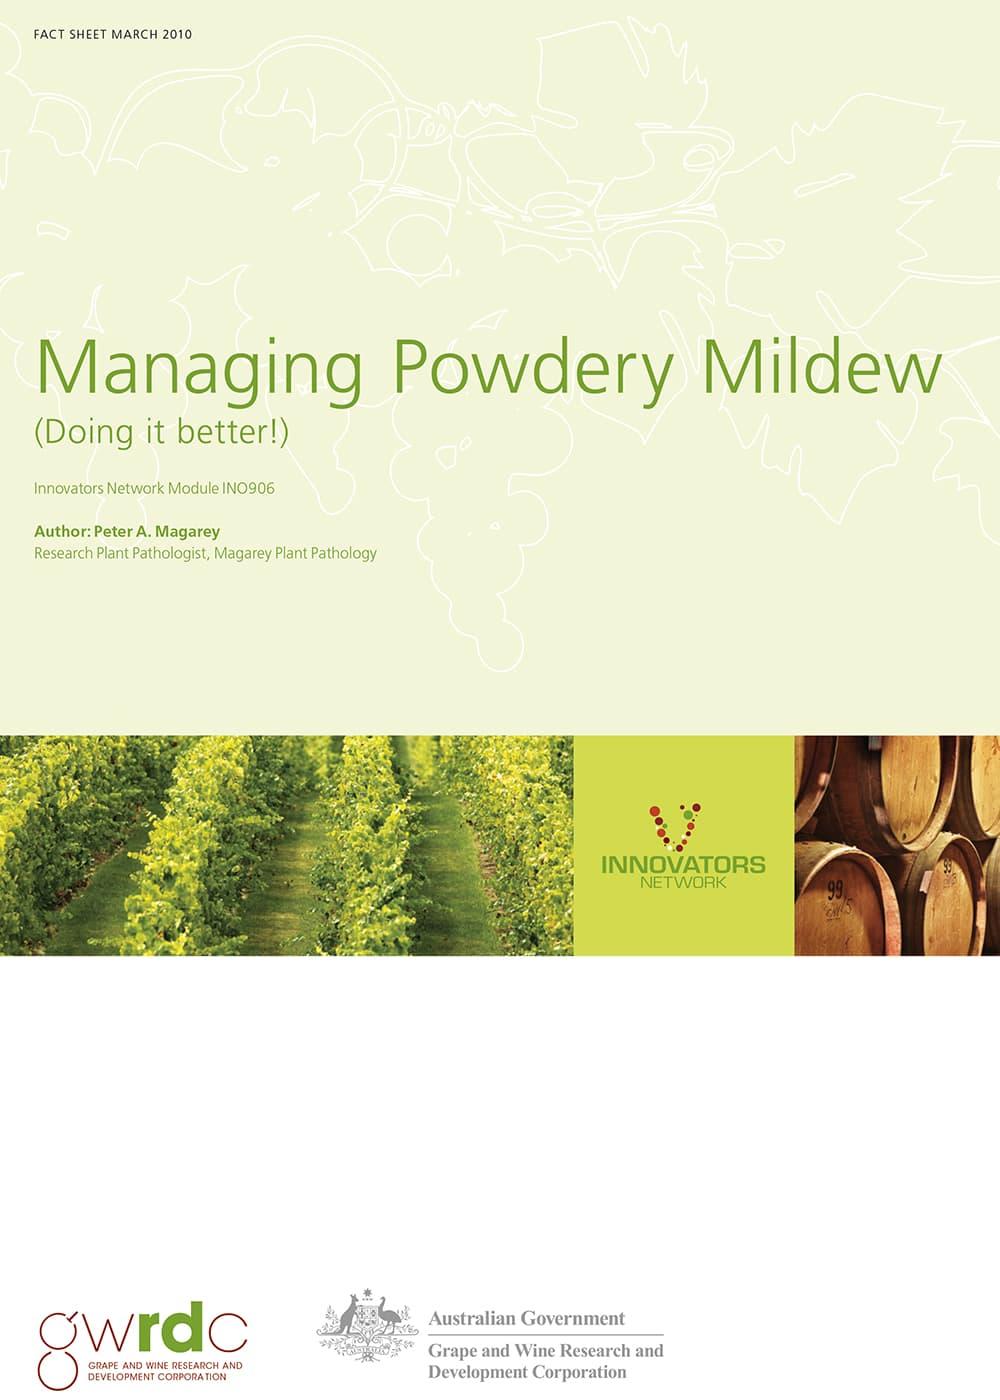 Powdery Mildew Factsheet